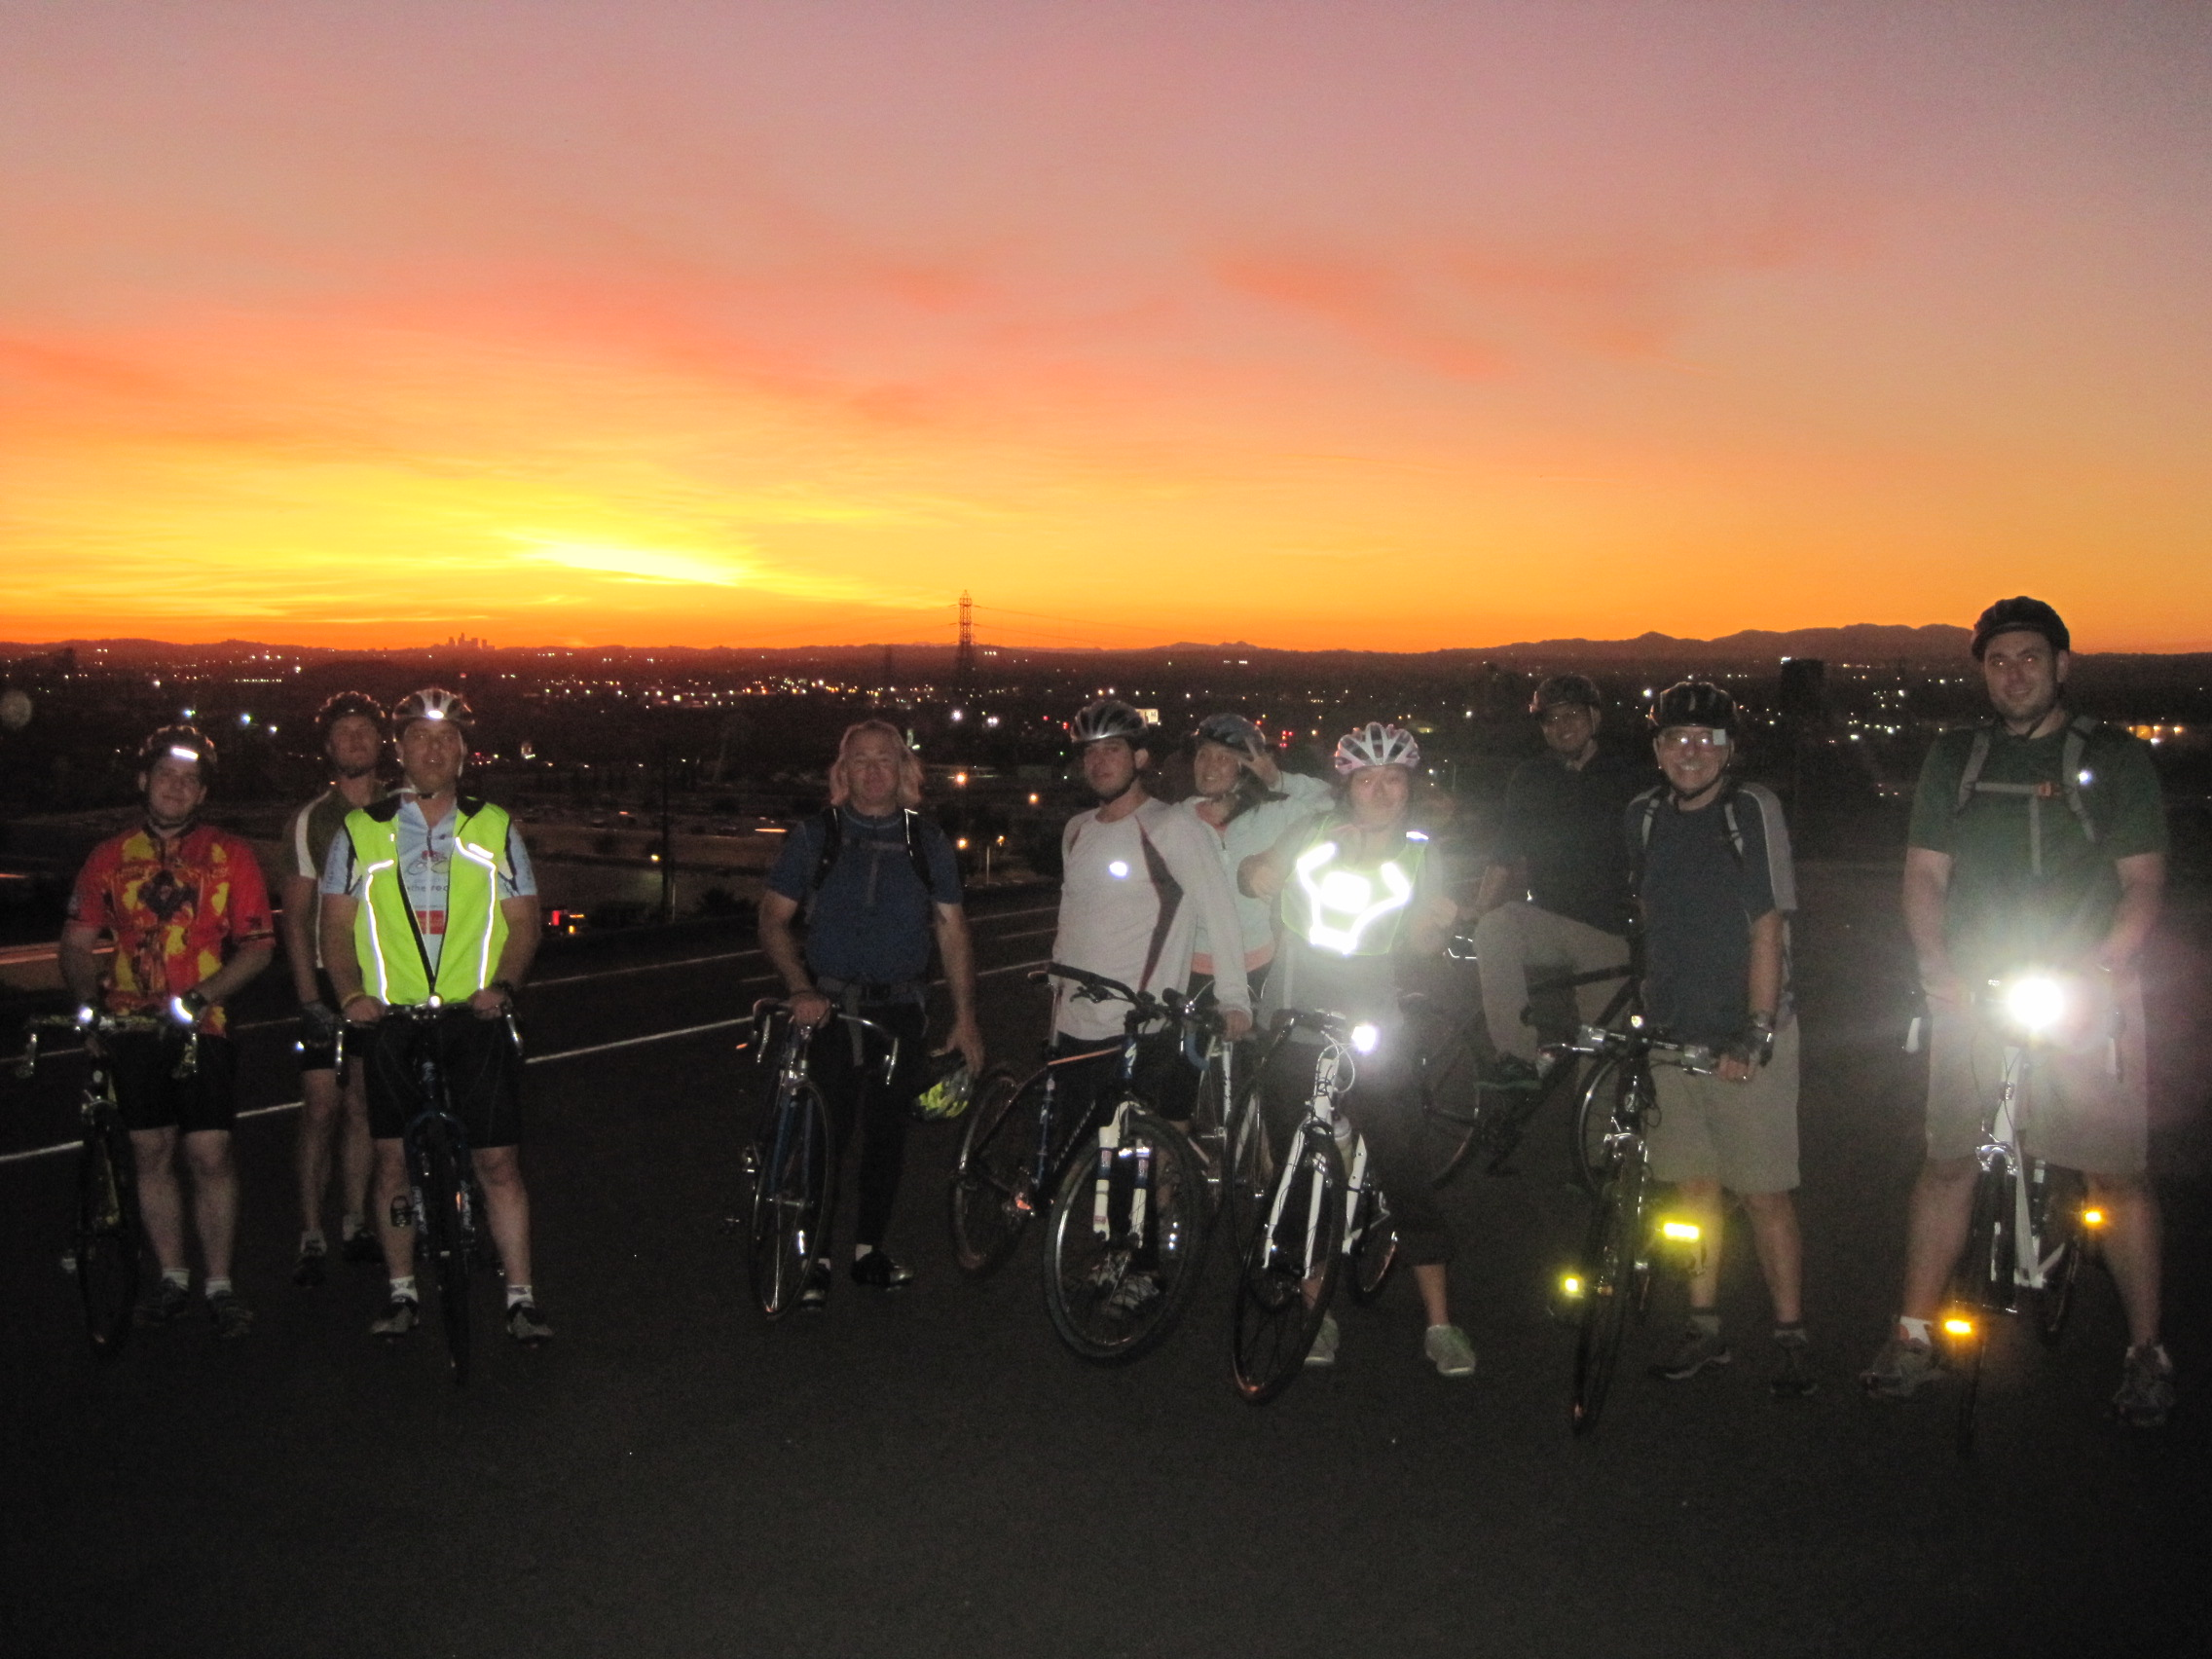 Wrightwood Elevation : Rei arcadia to santa fe dam bike ride summit ascents